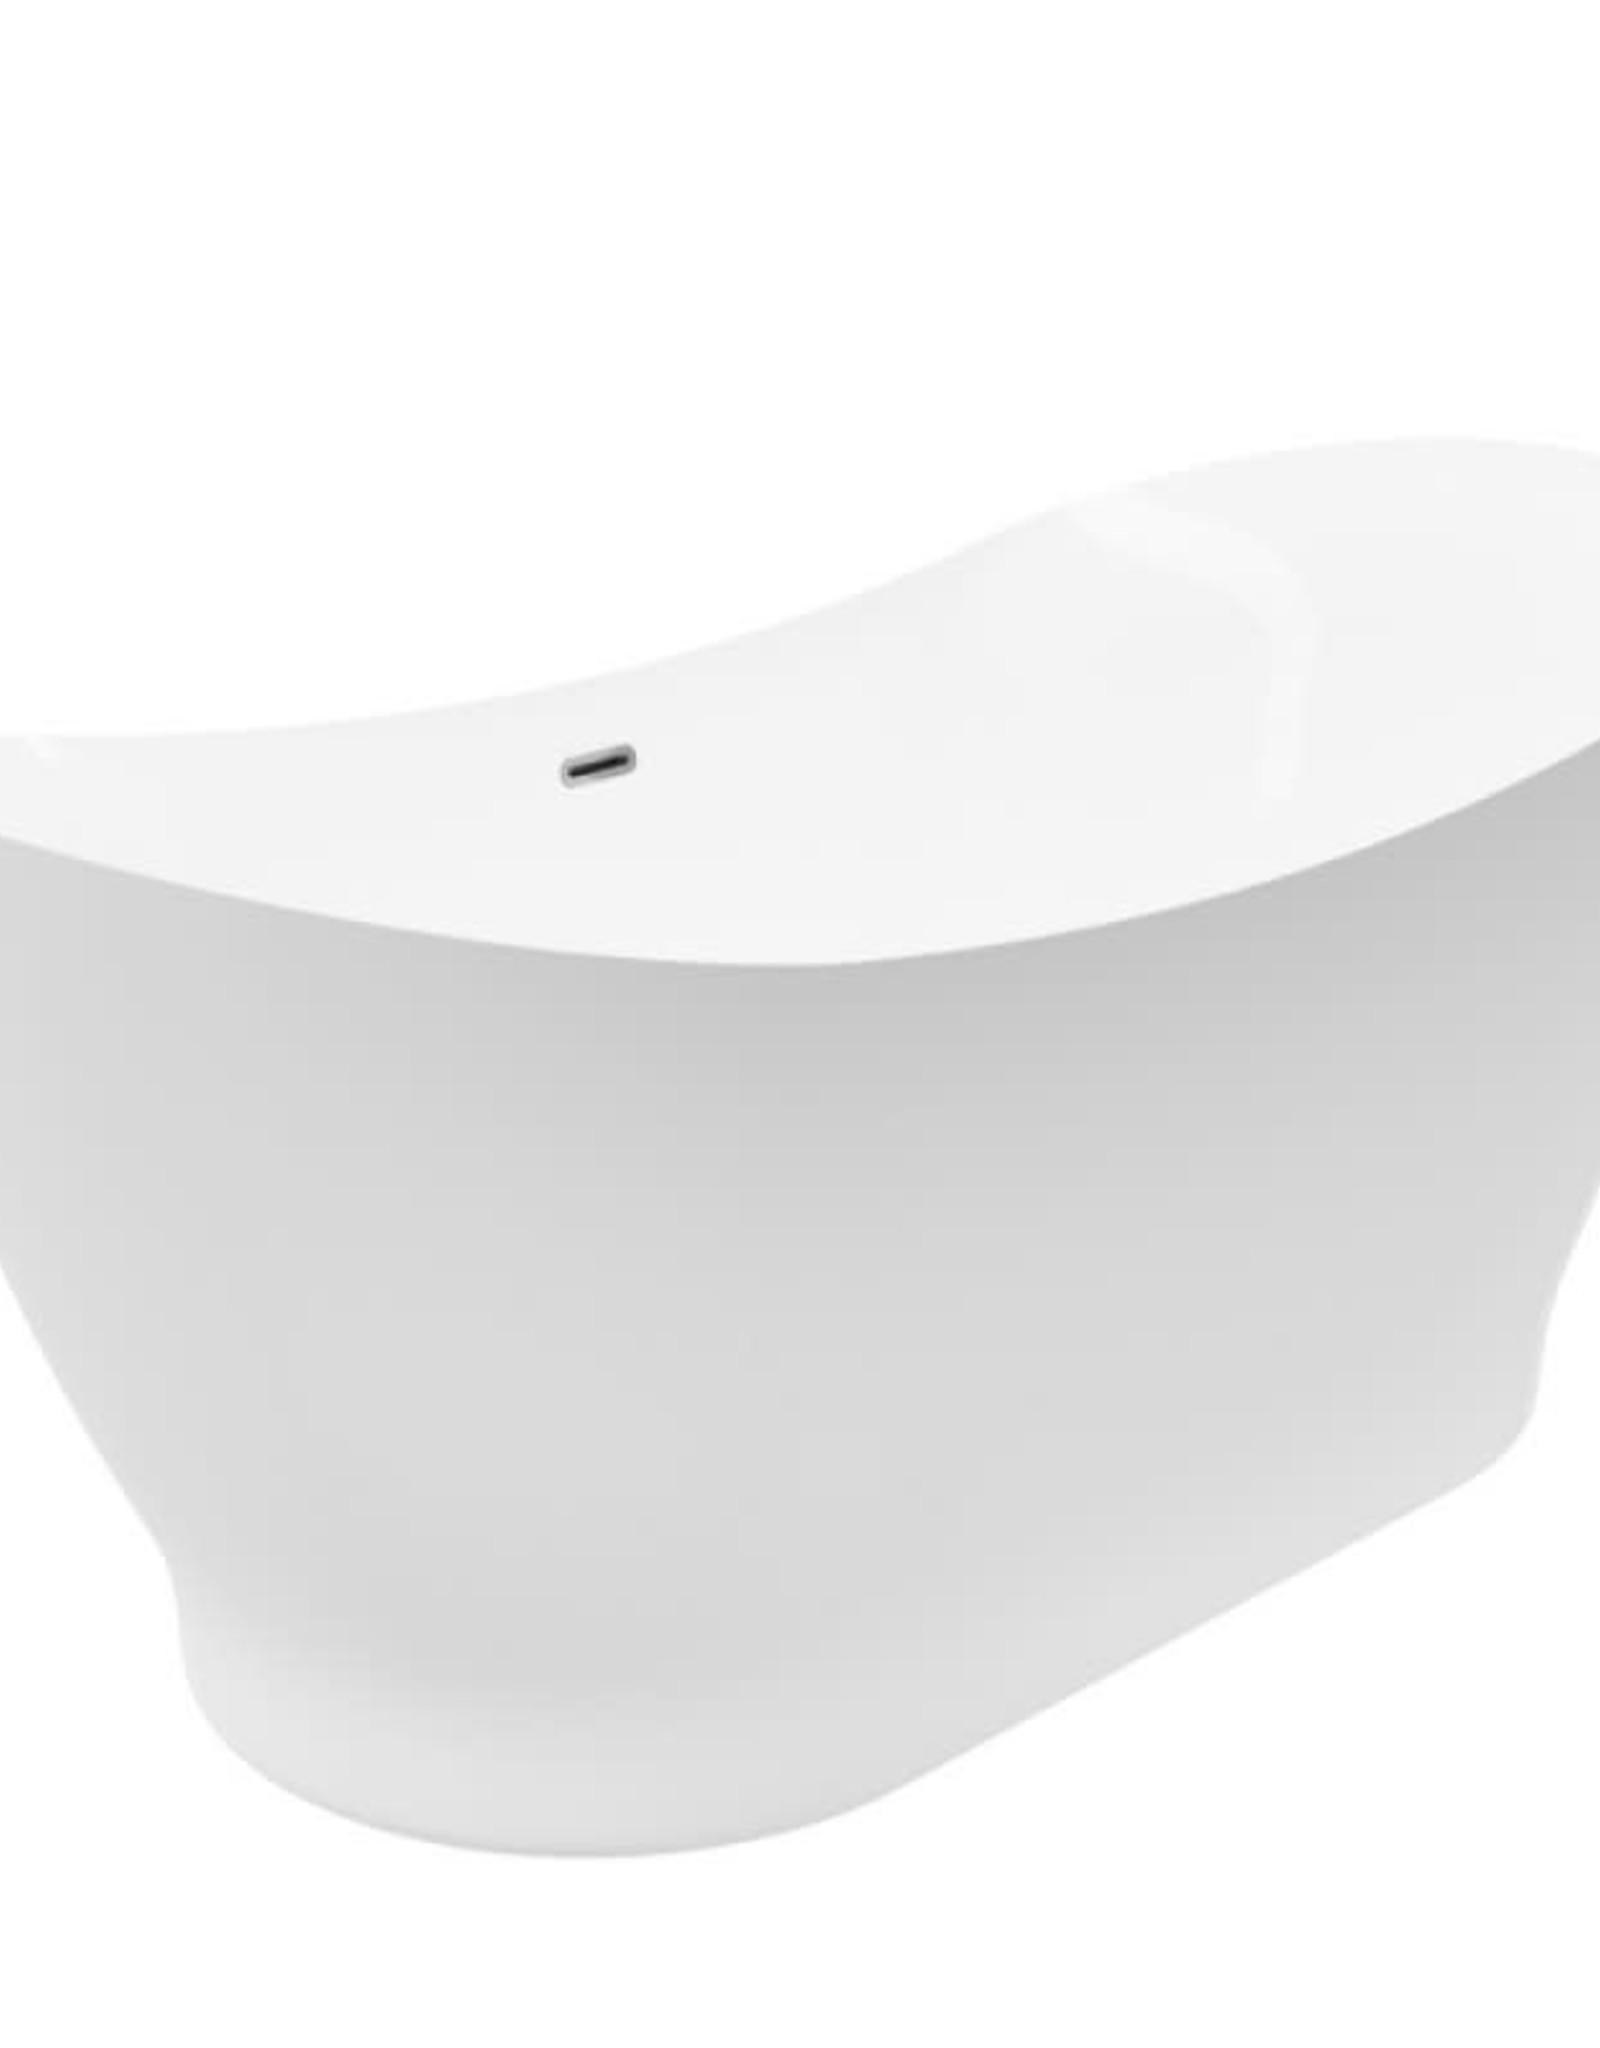 "Bain Signature Bain Signature Naya 66"" Freestanding Tub"